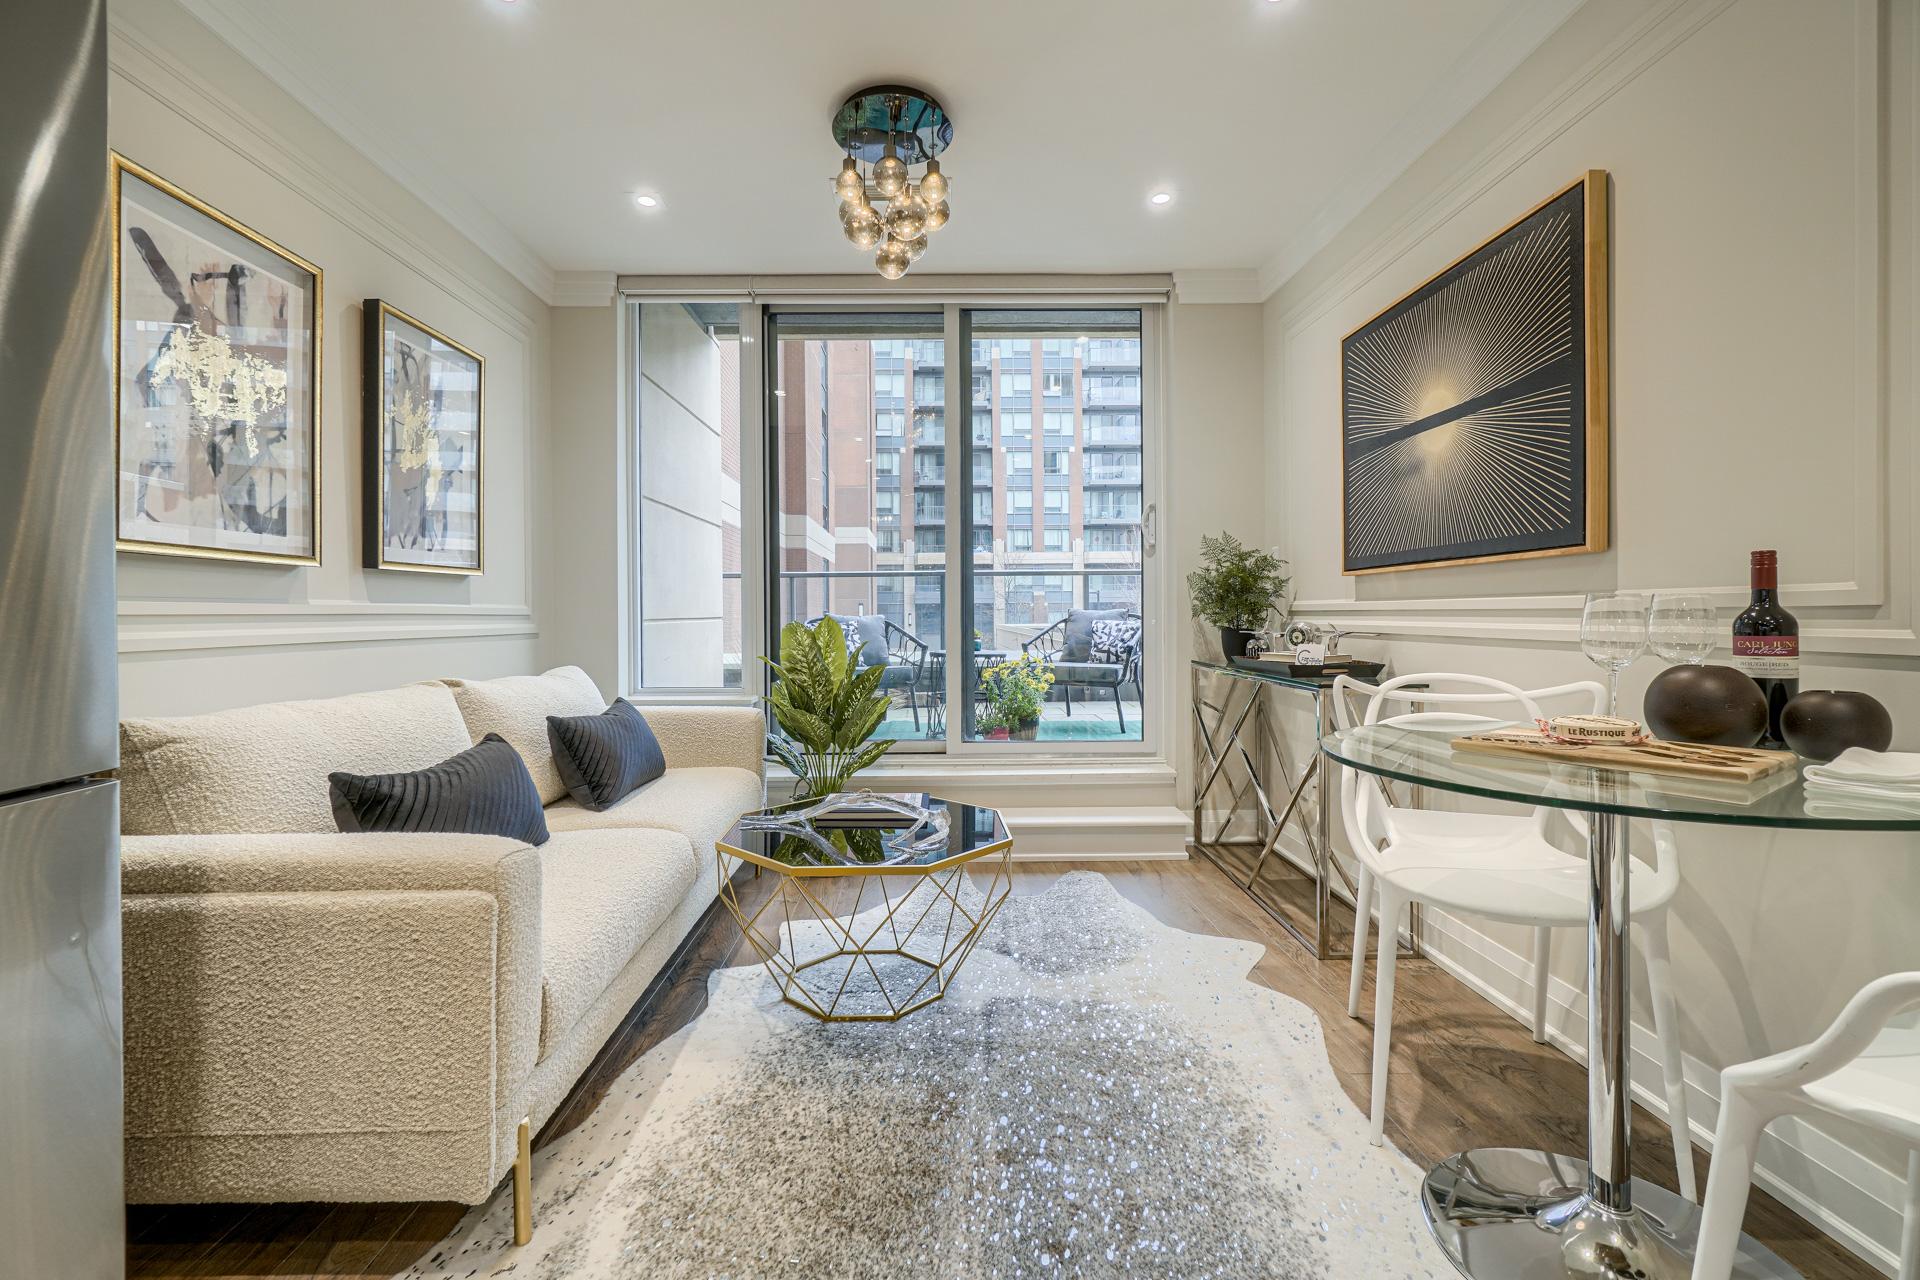 Condo renos by Gta Fine Interiors18 Uptown Dr Suite 229